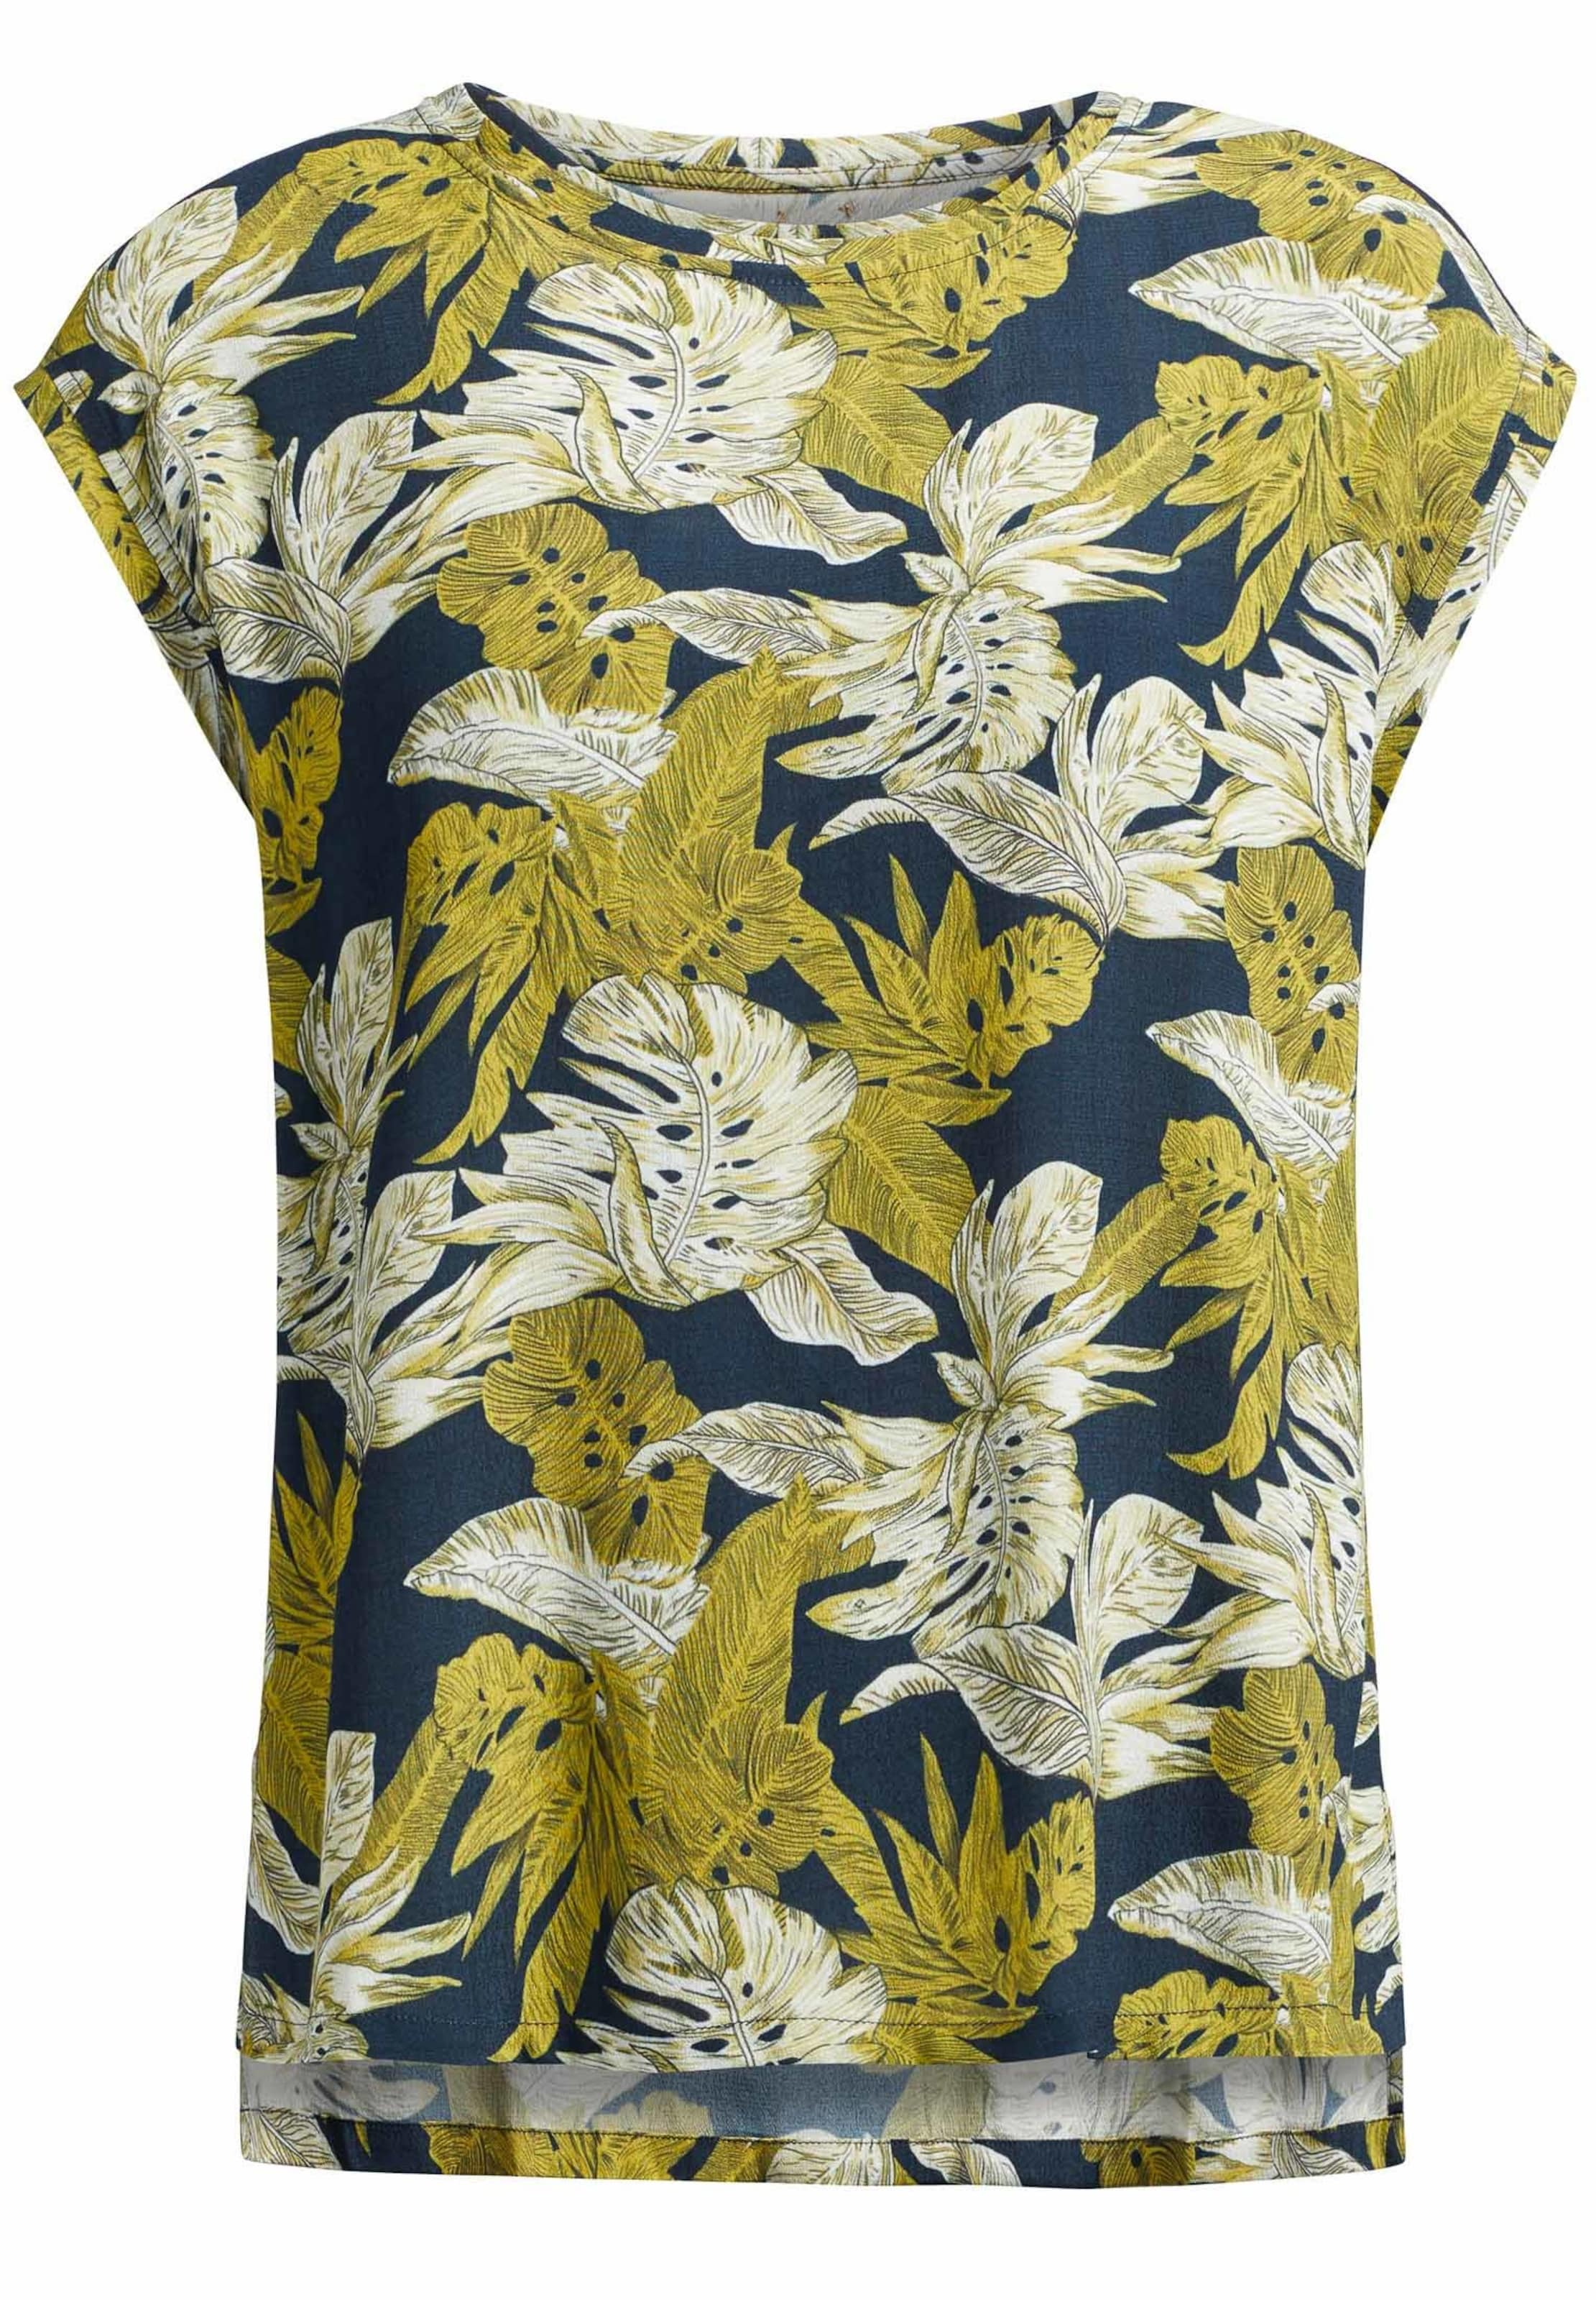 'anfisia' Khujo shirt En Foncé ClairKaki Vert T Gris K1ucTlFJ35